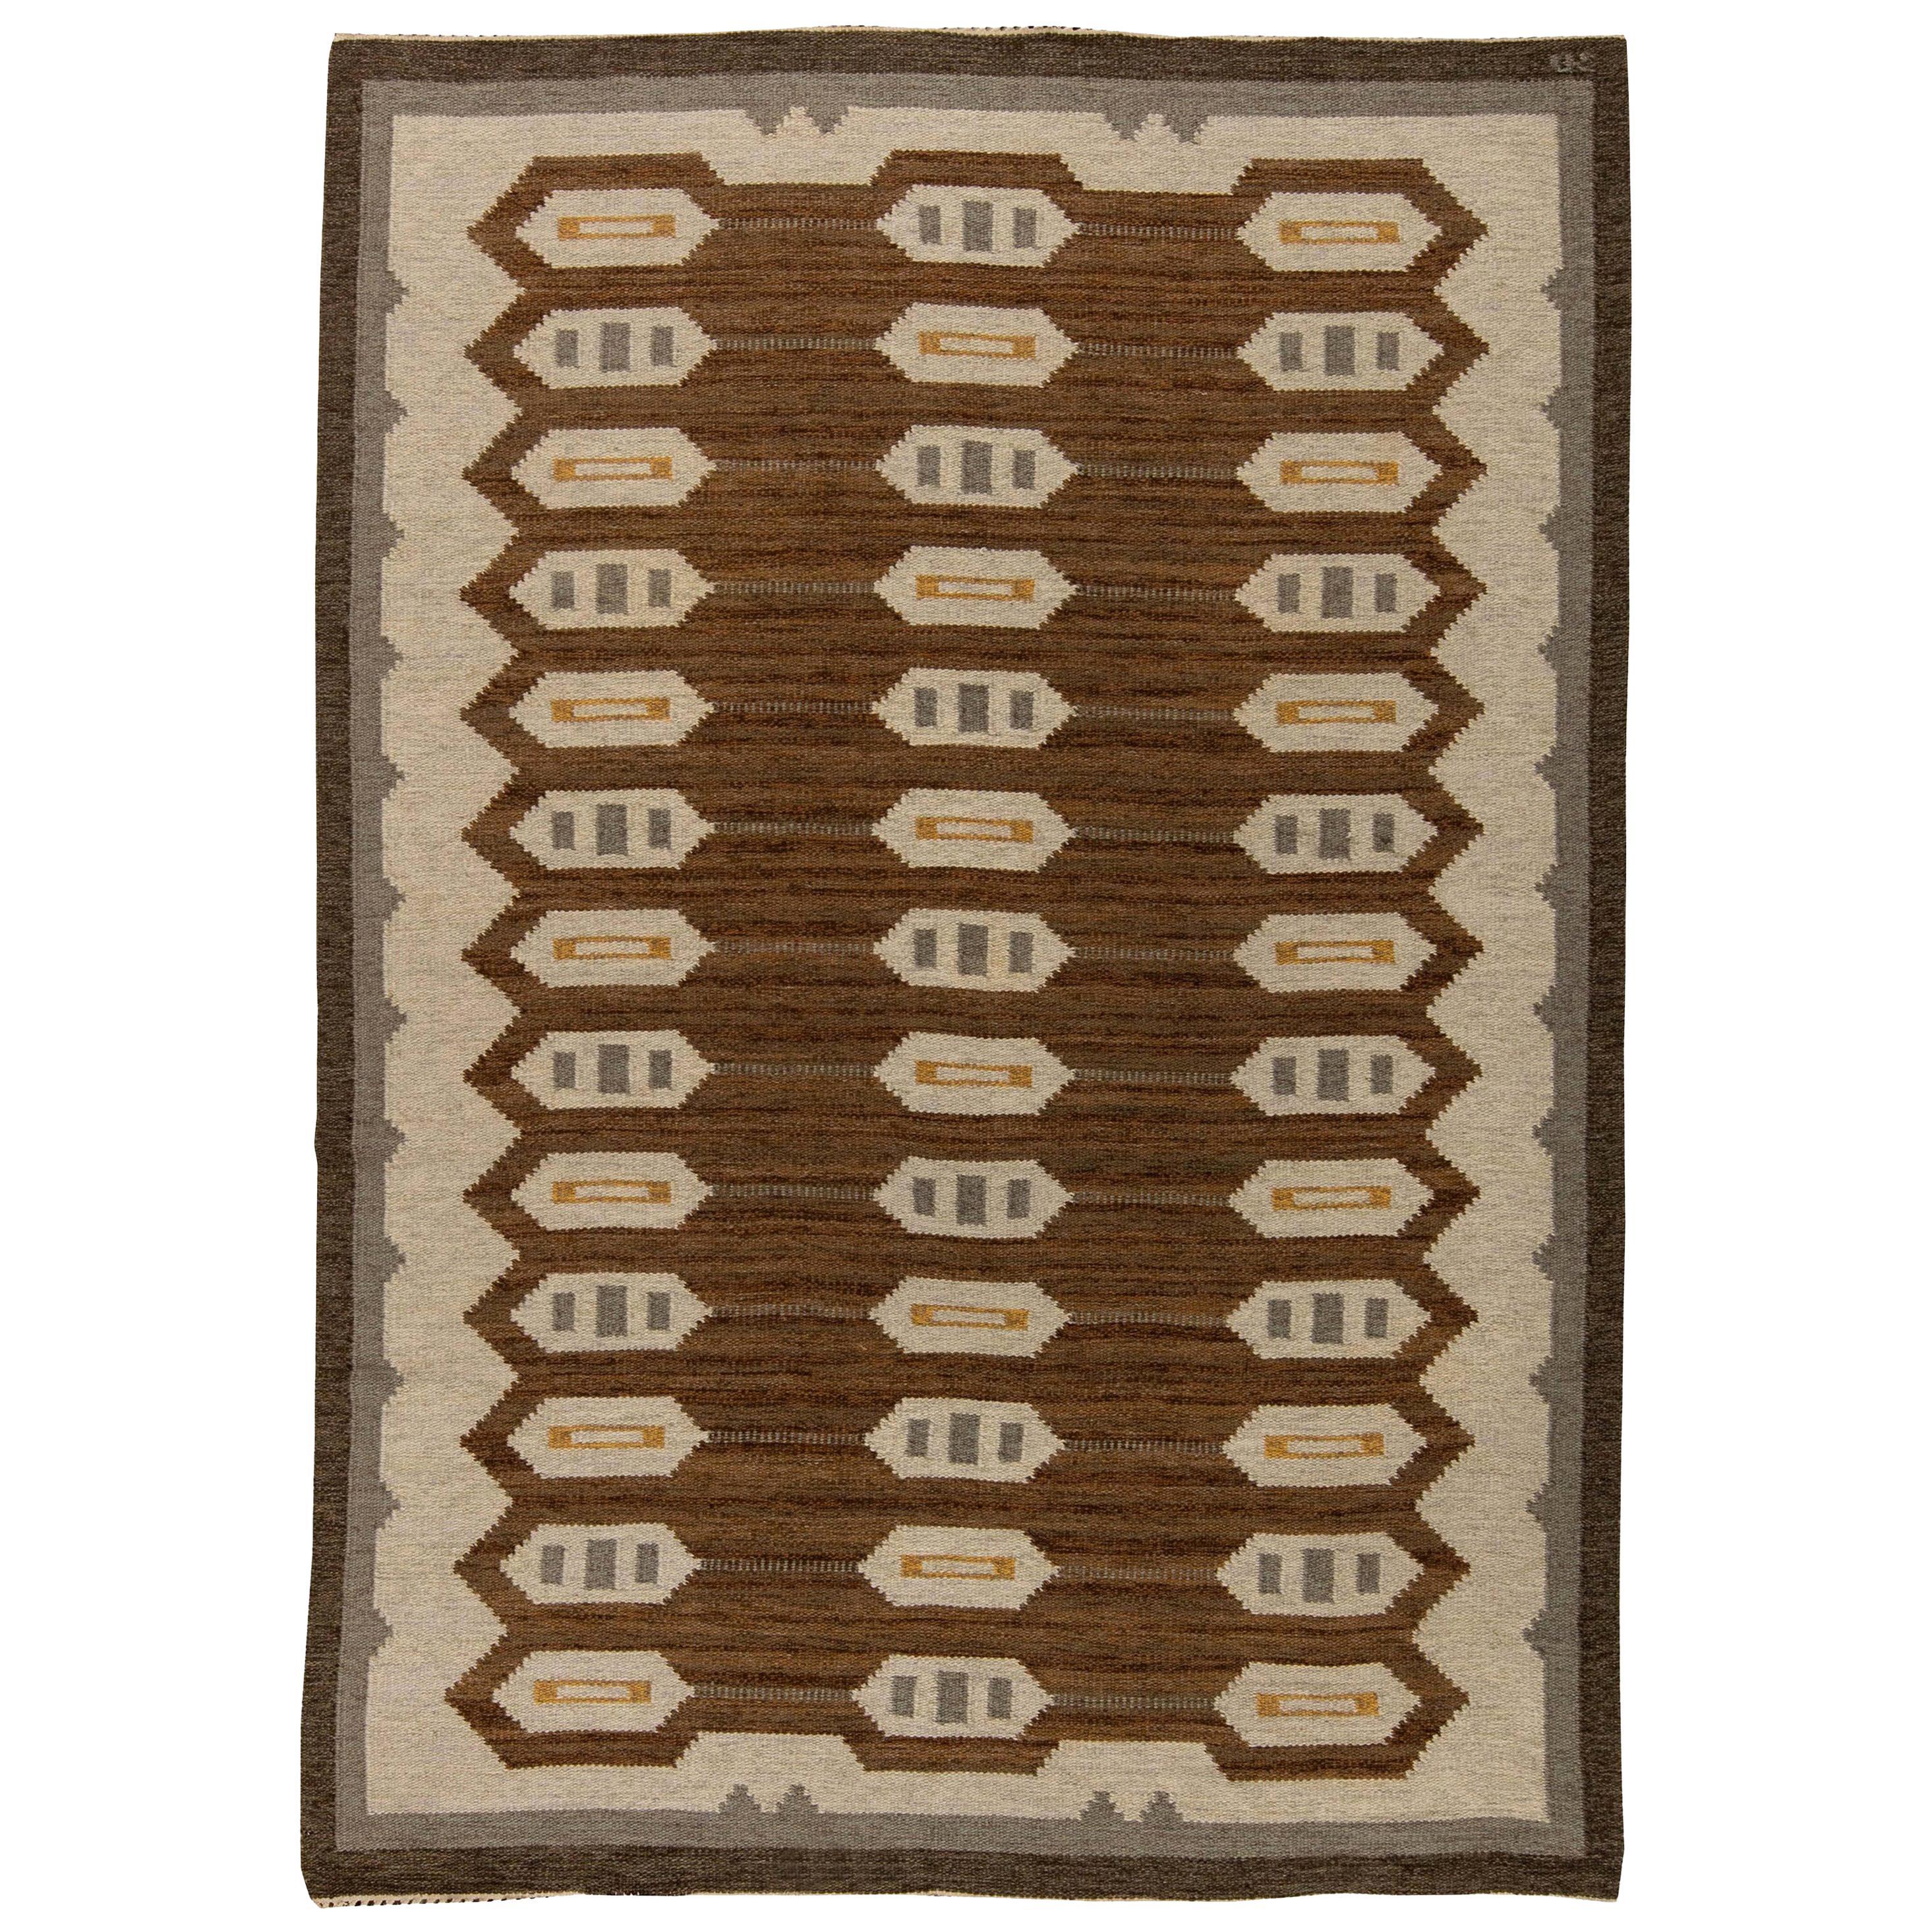 Midcentury Swedish Brown, Gray and Beige Flat-Woven Wool Rug